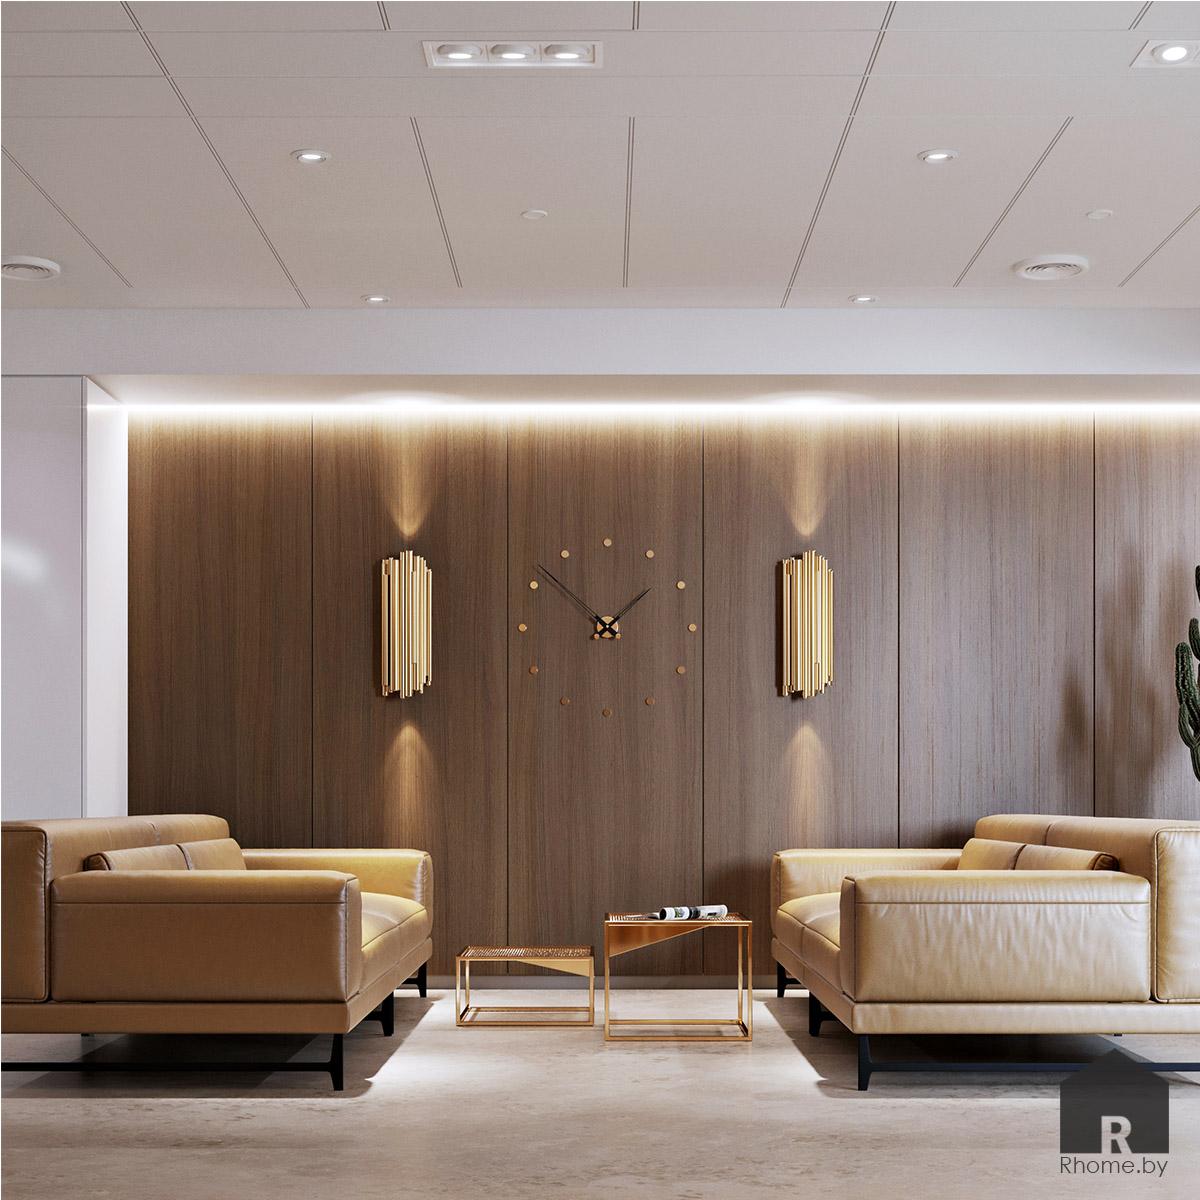 Дизайн интерьера ресепшна | Дизайн студия – Rhome.by